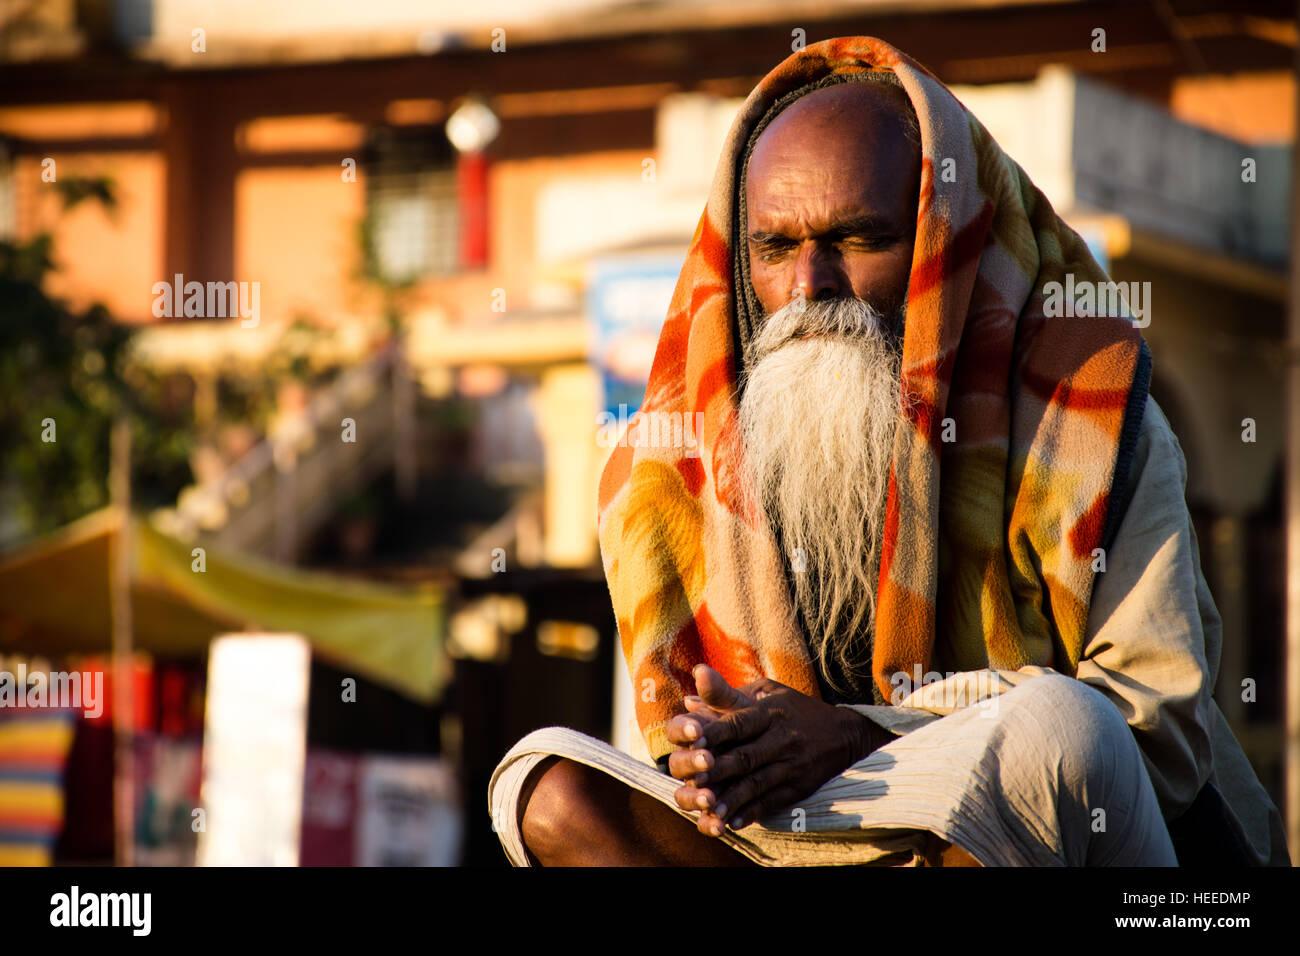 A sadhu doing his morning prayers. - Stock Image